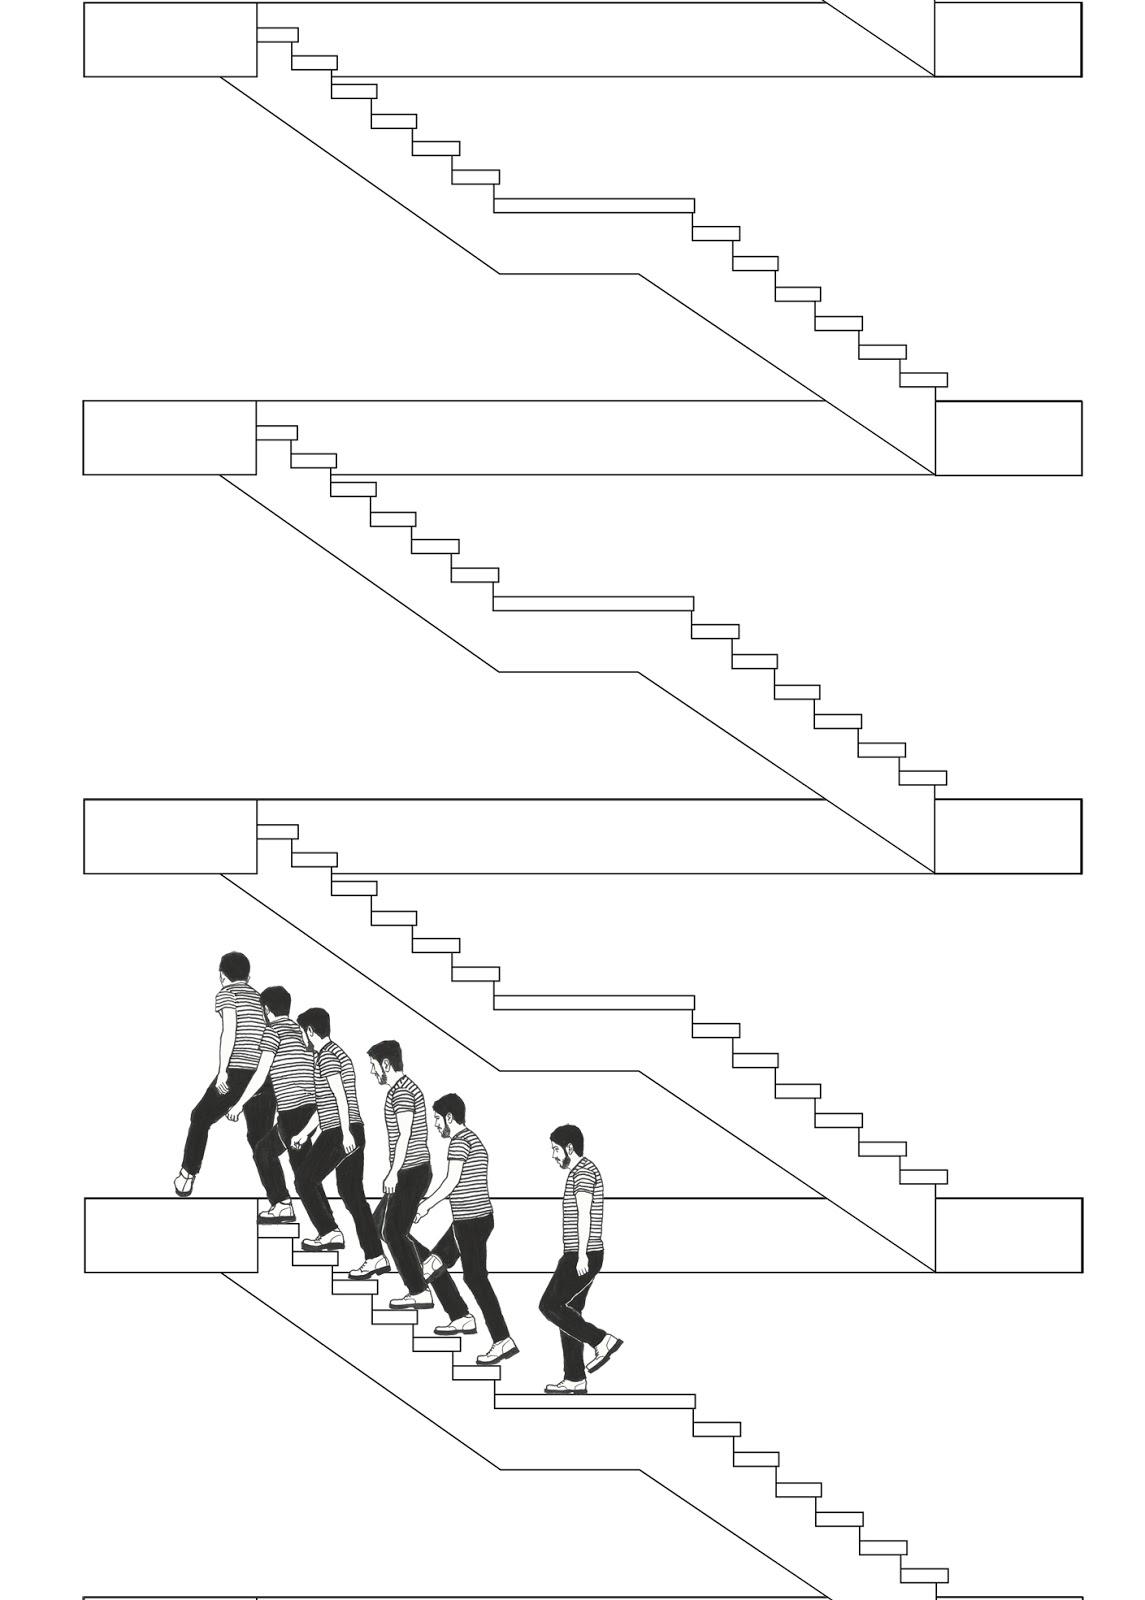 Escaleras infinitas manuel calder n dibujos for Escaleras infinitas